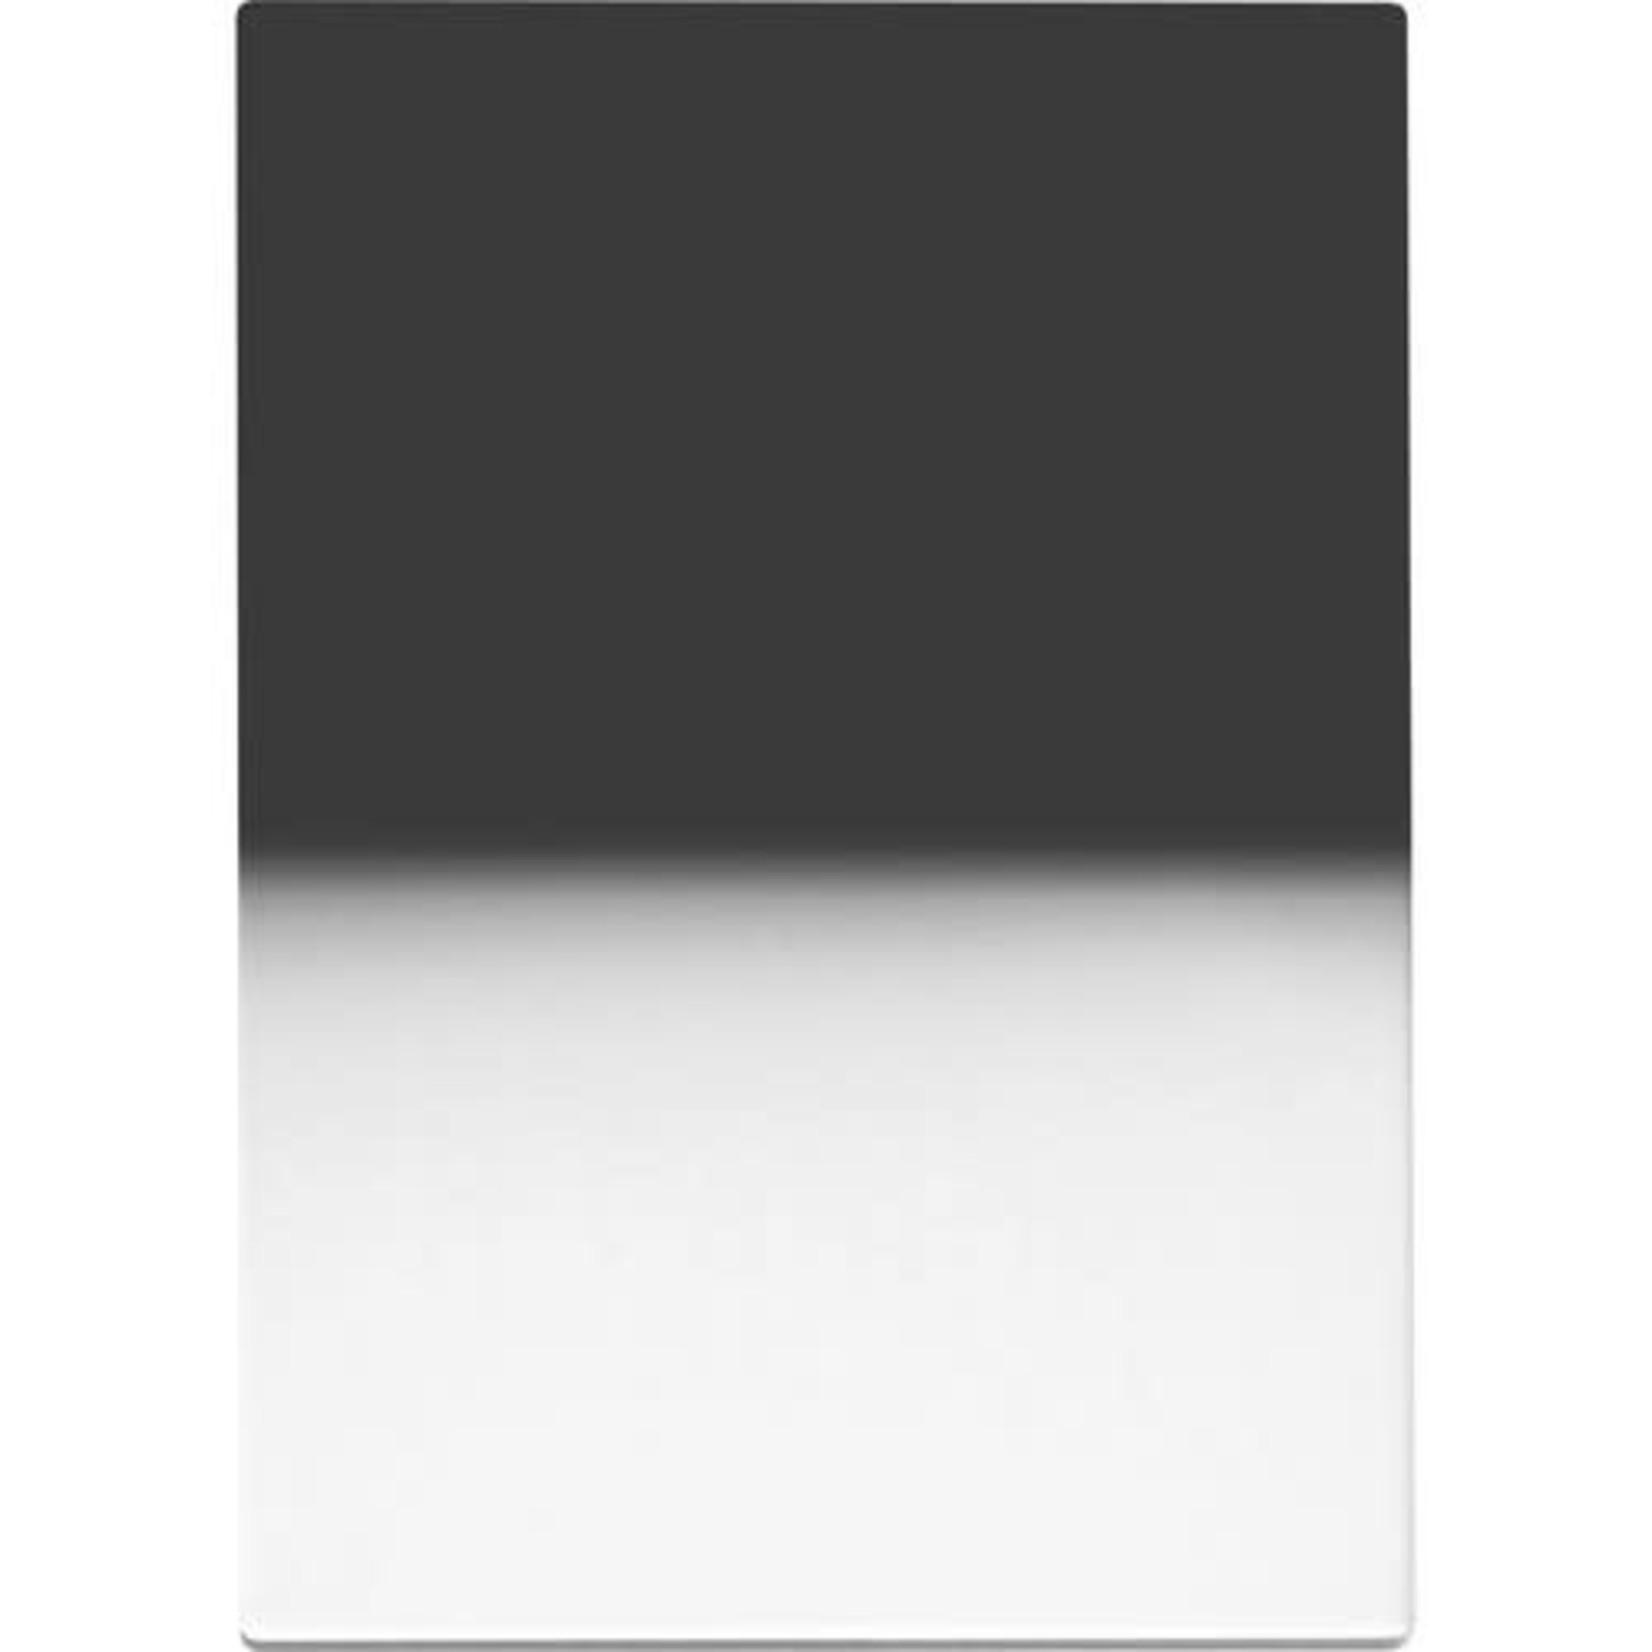 Lee LEE Filters 100 x 150mm Hard Graduated Neutral Density 1.2 Filter